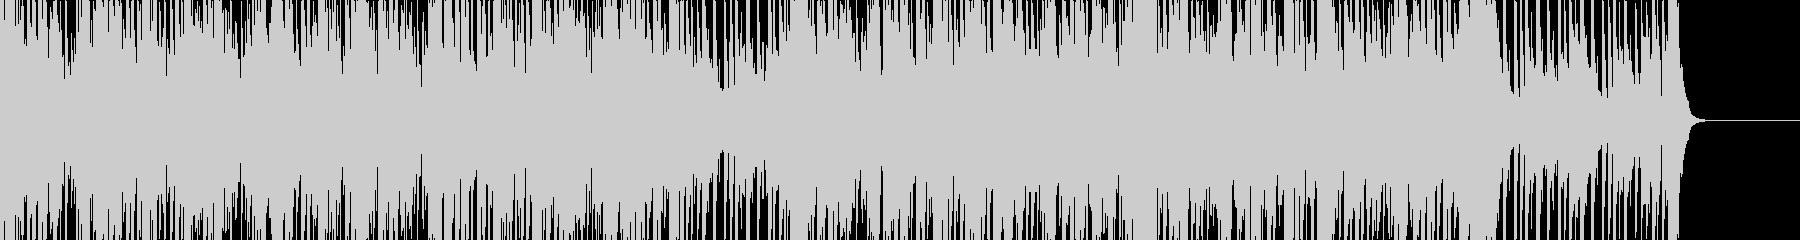 Jazz風ブルースギター・夜のイメージの未再生の波形